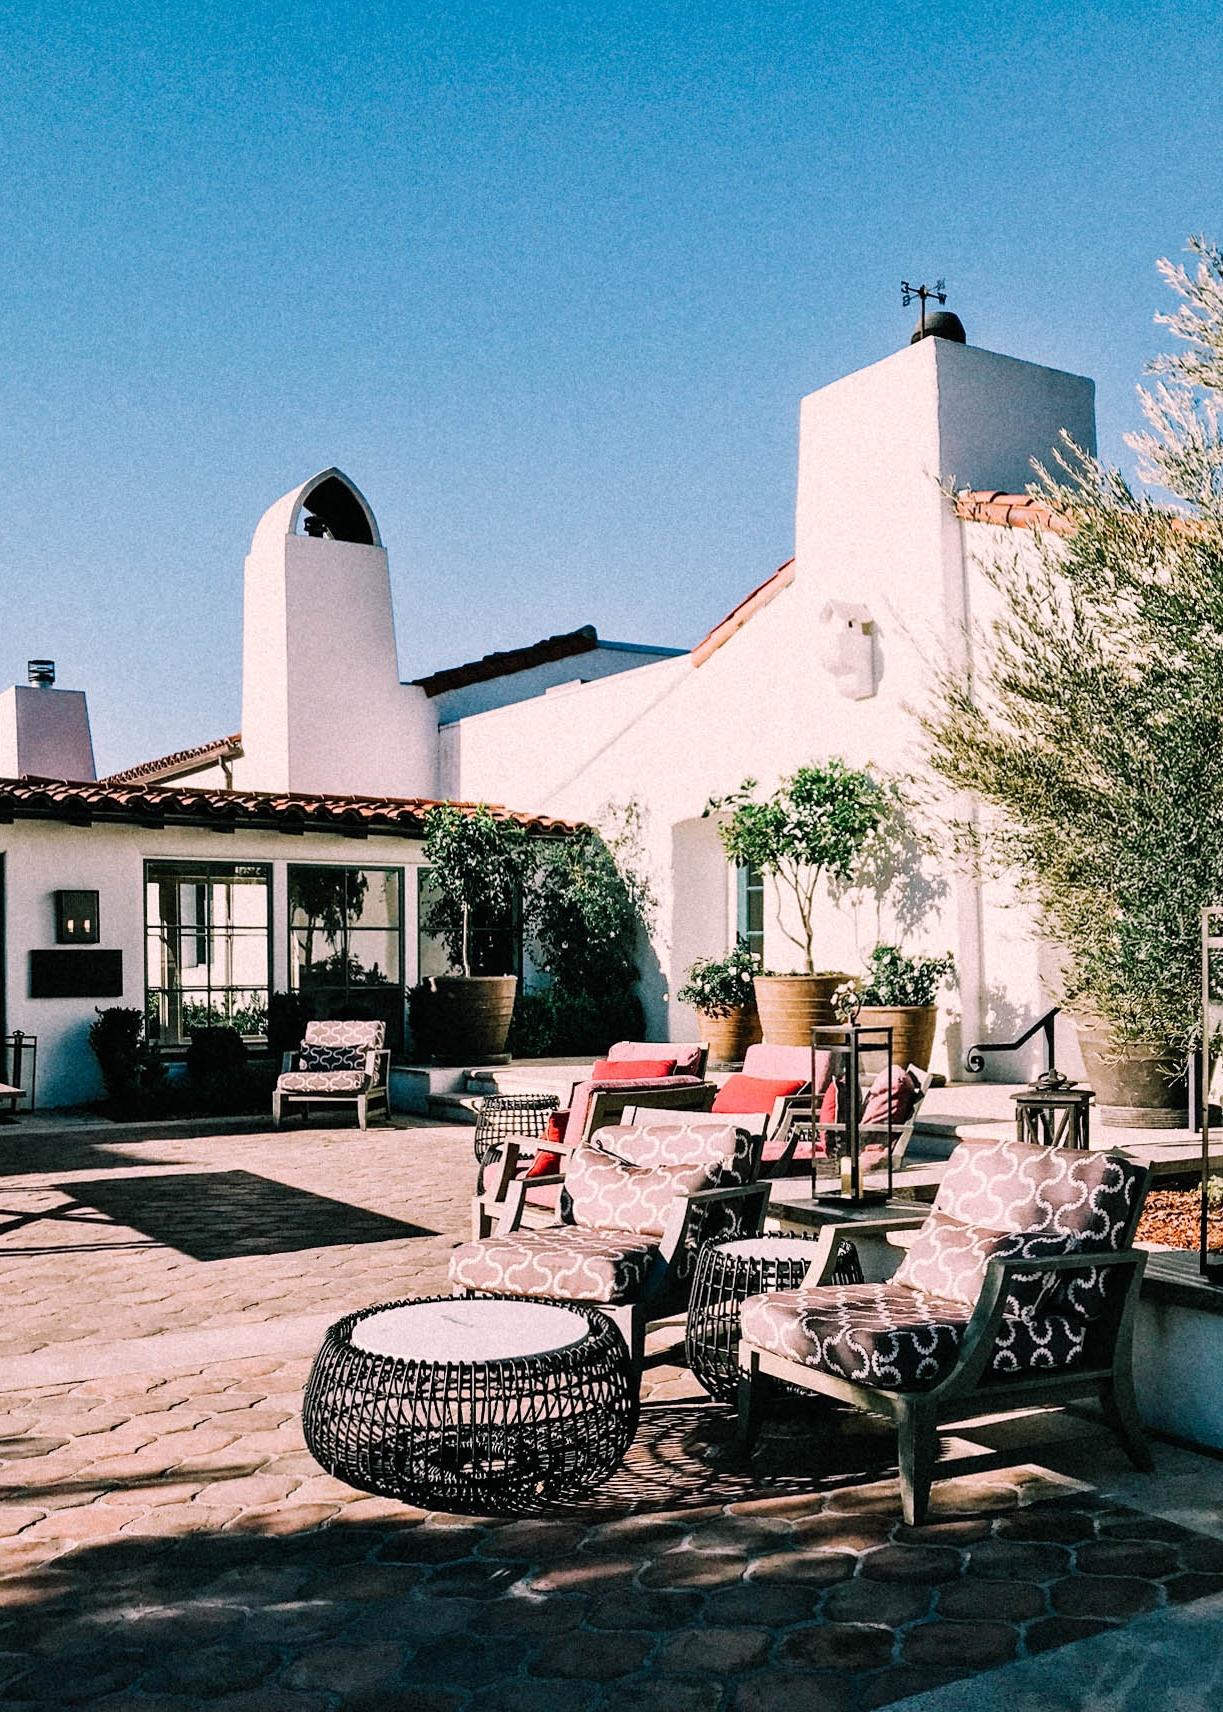 Ojai Valley Inn | A Fabulous Fete